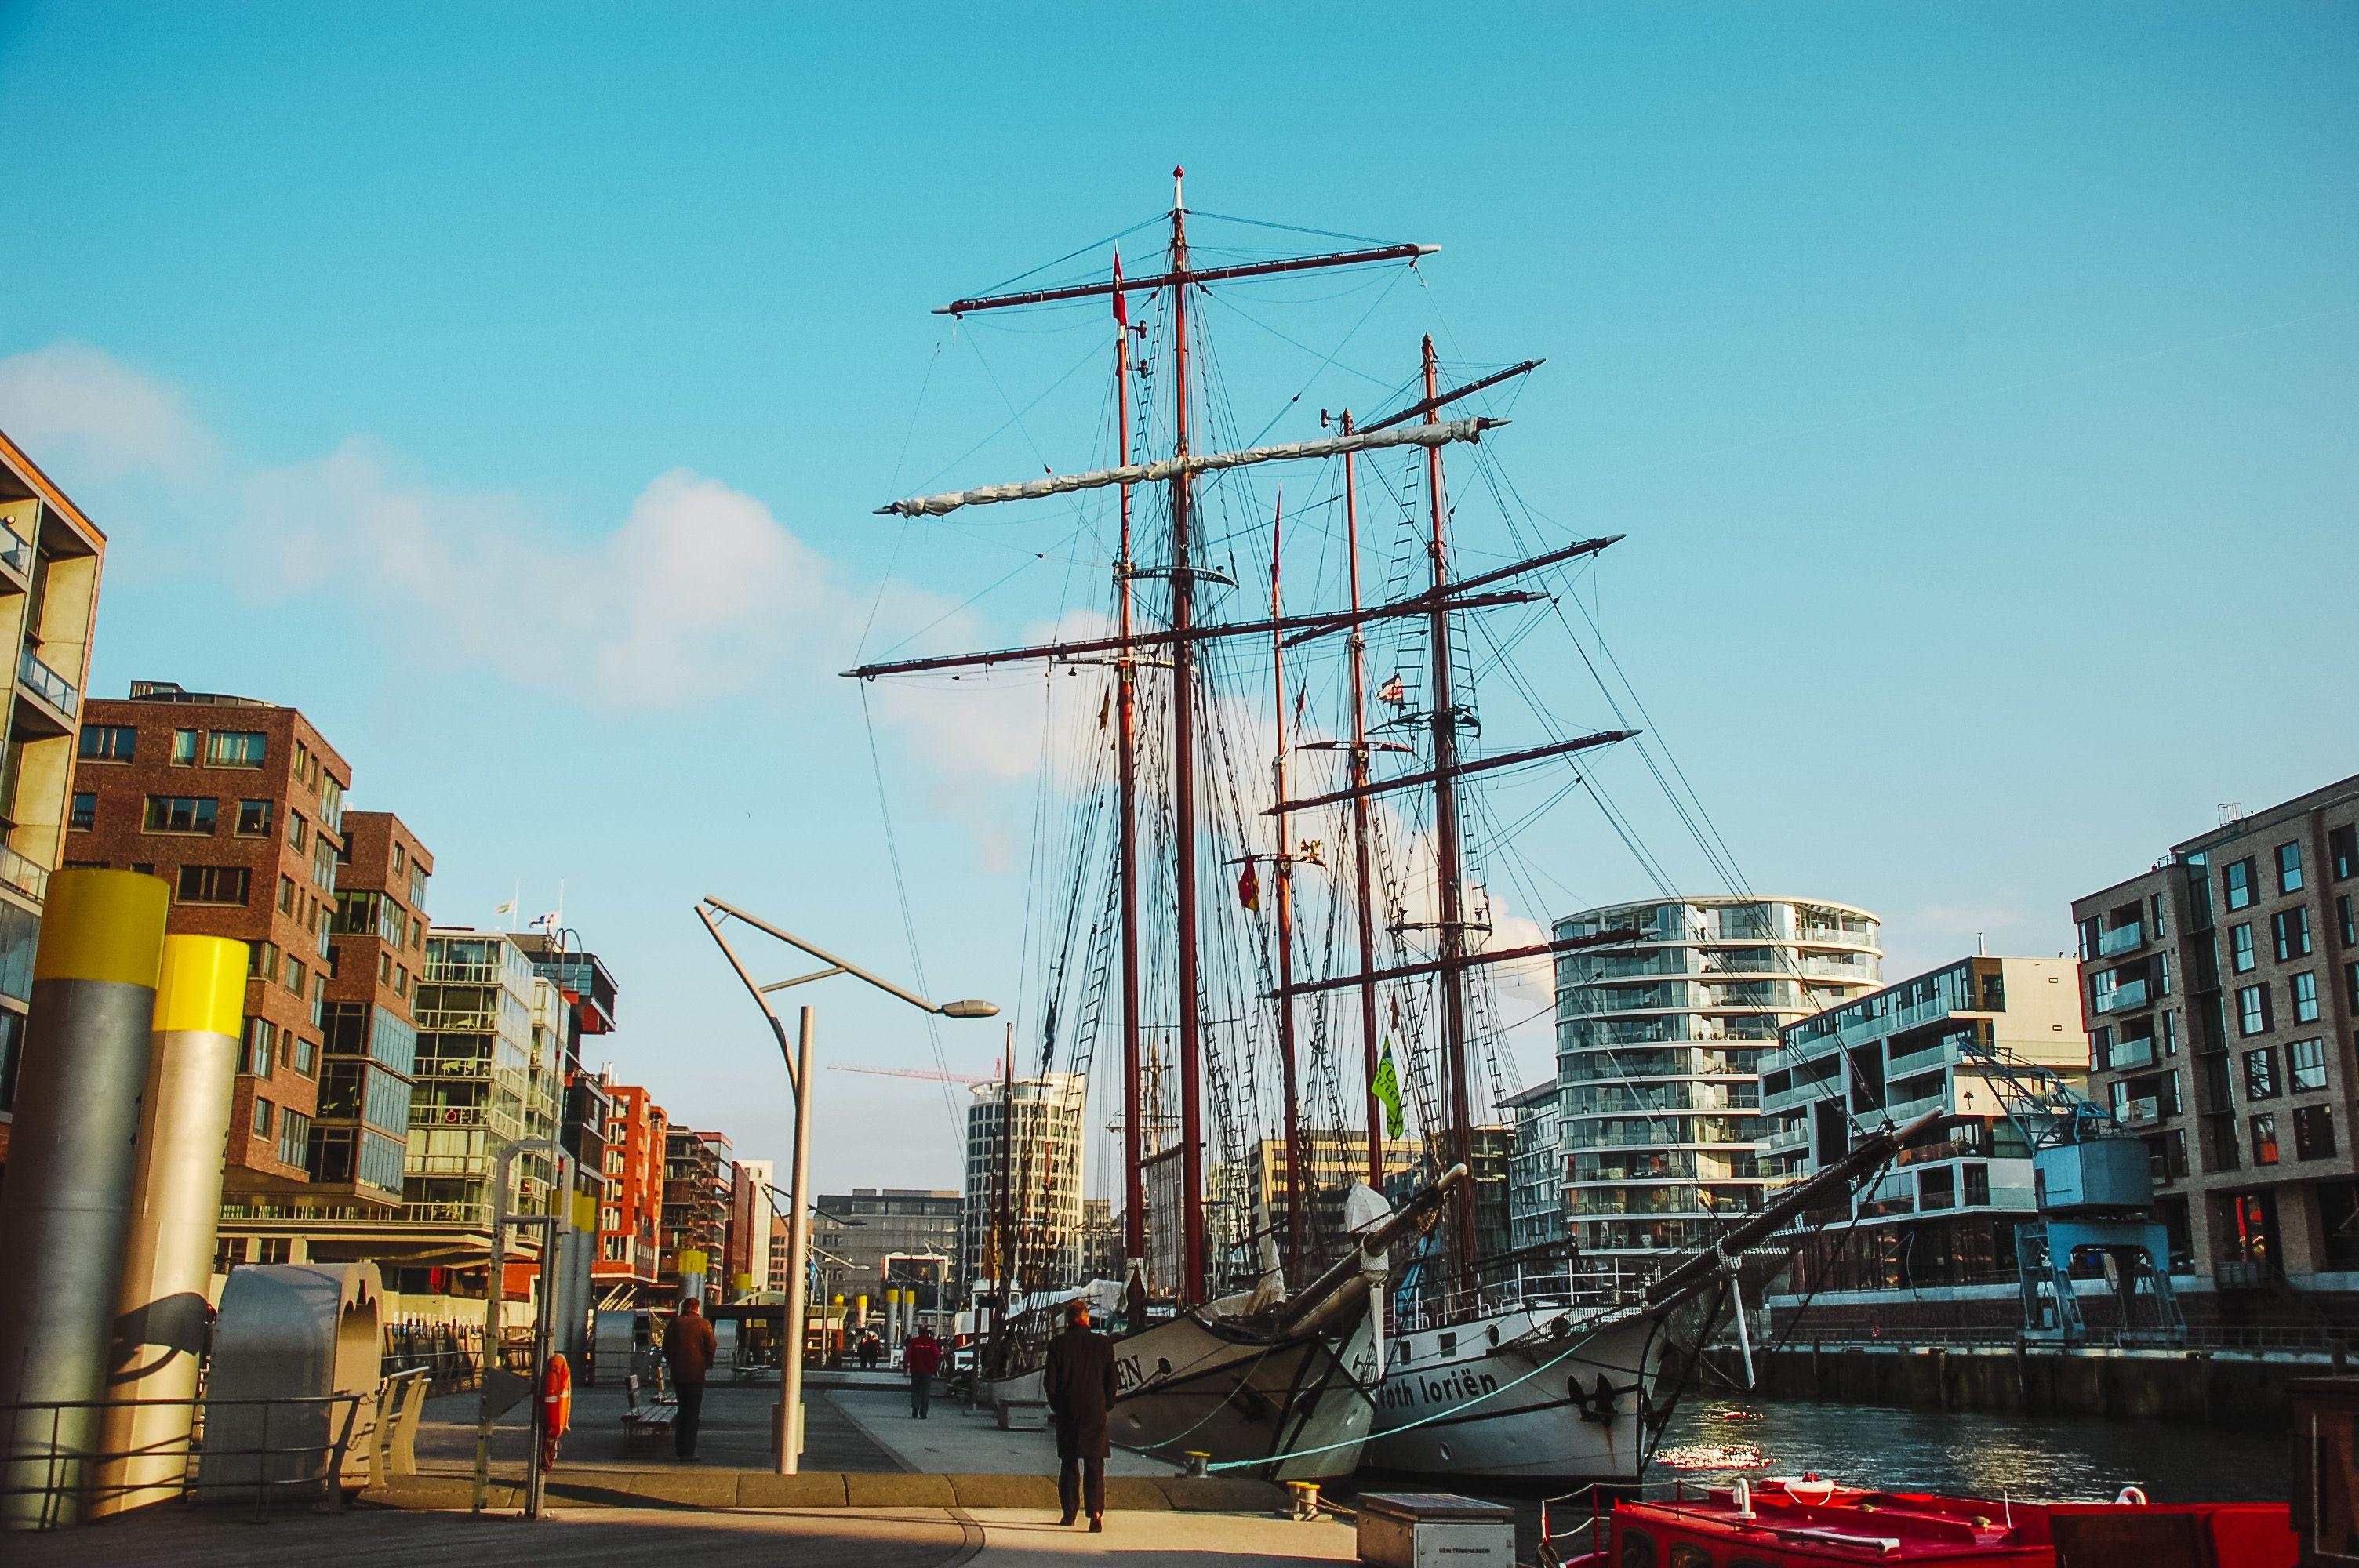 The harbor in Hamburg